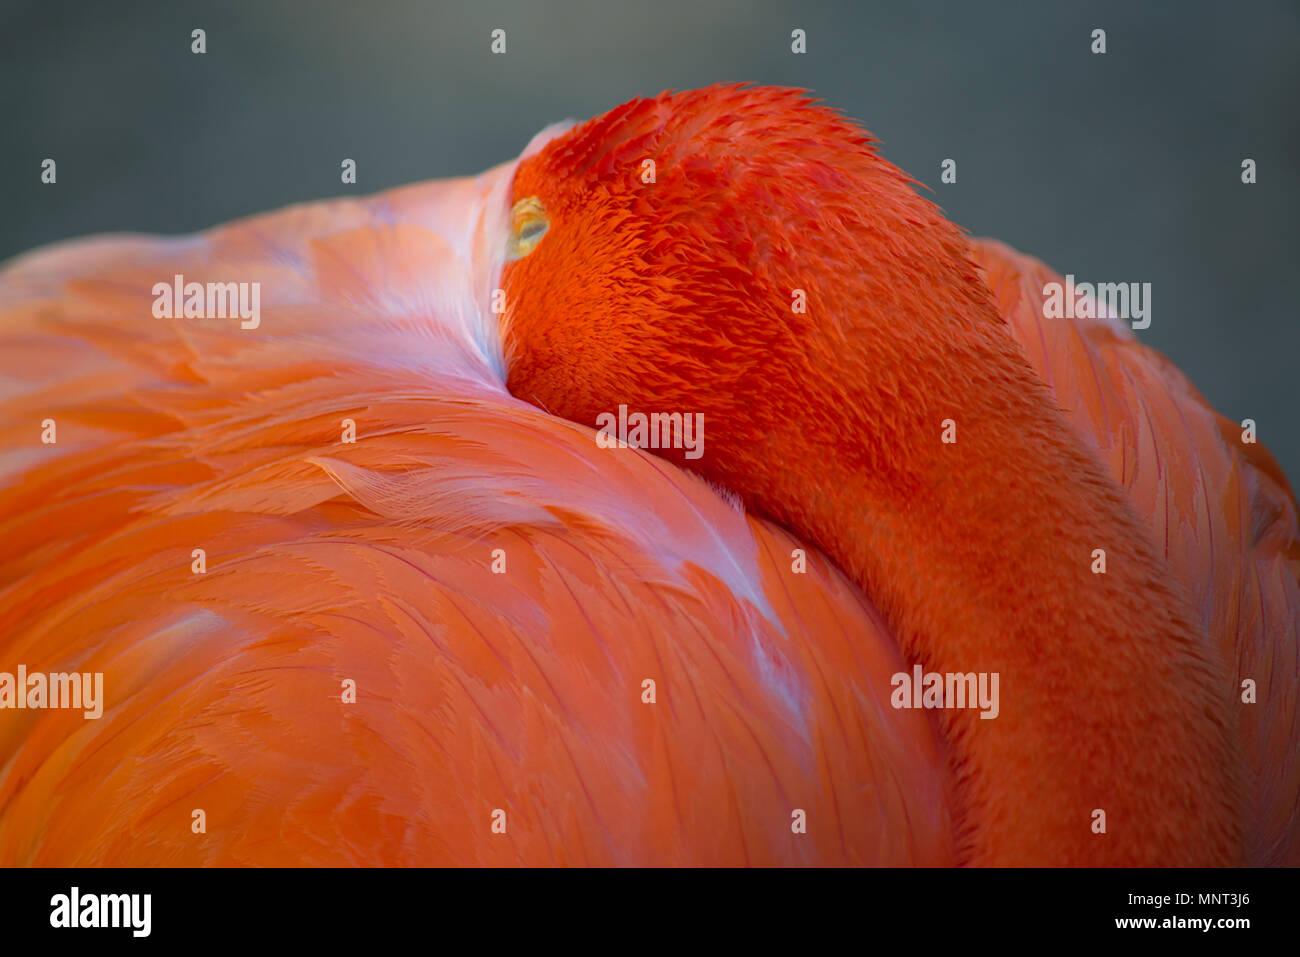 Flamingo at San Diego Zoo - Stock Image